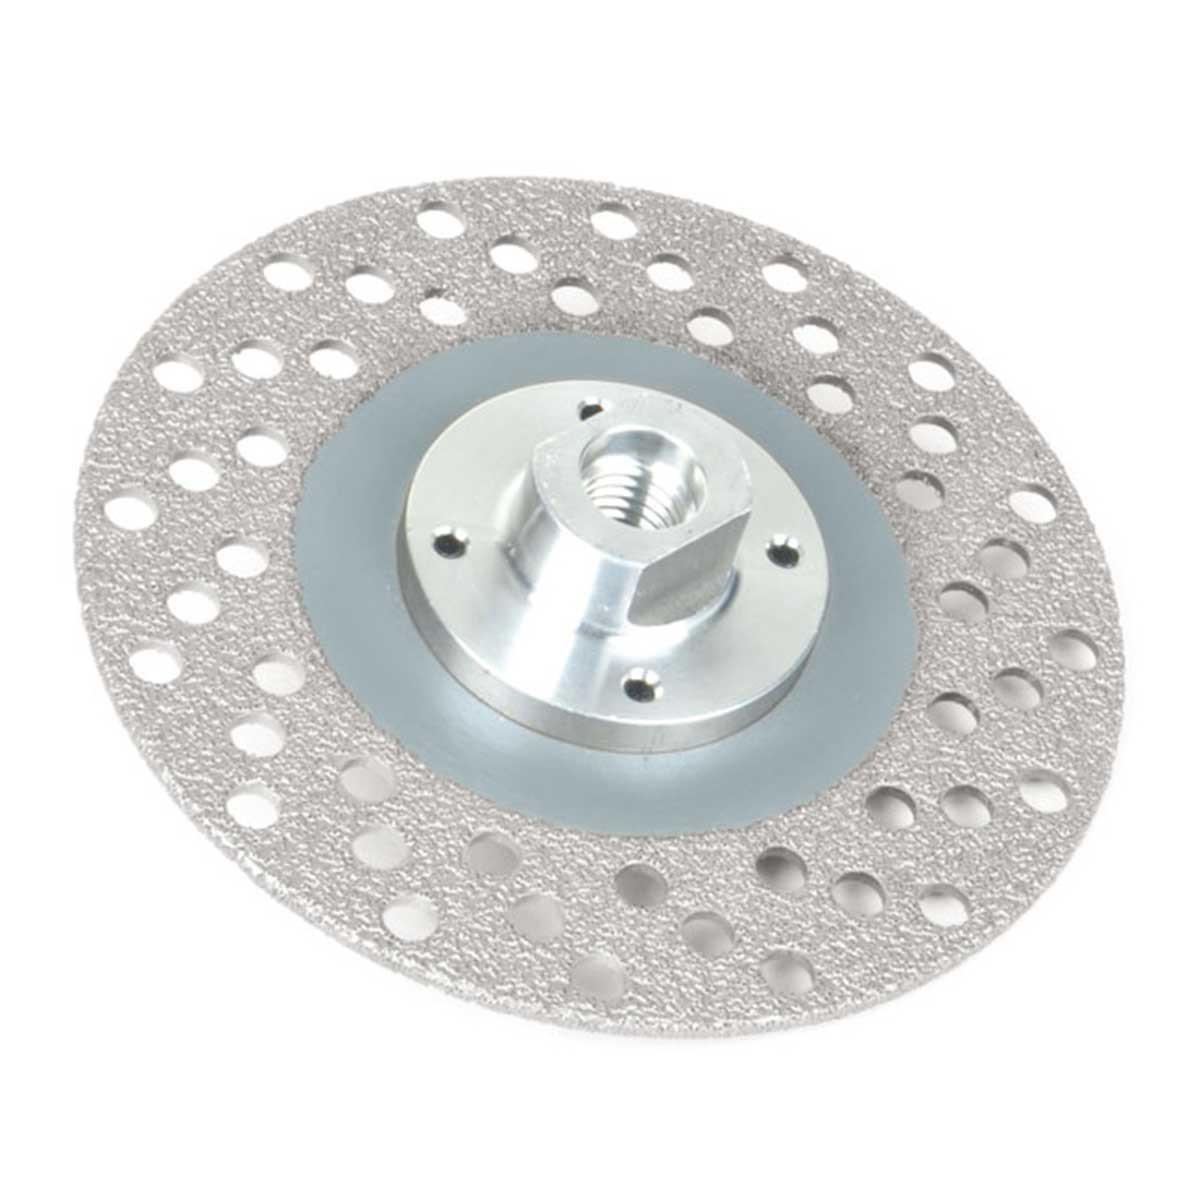 5 inch Diamond Cutting and Grinding Wheel